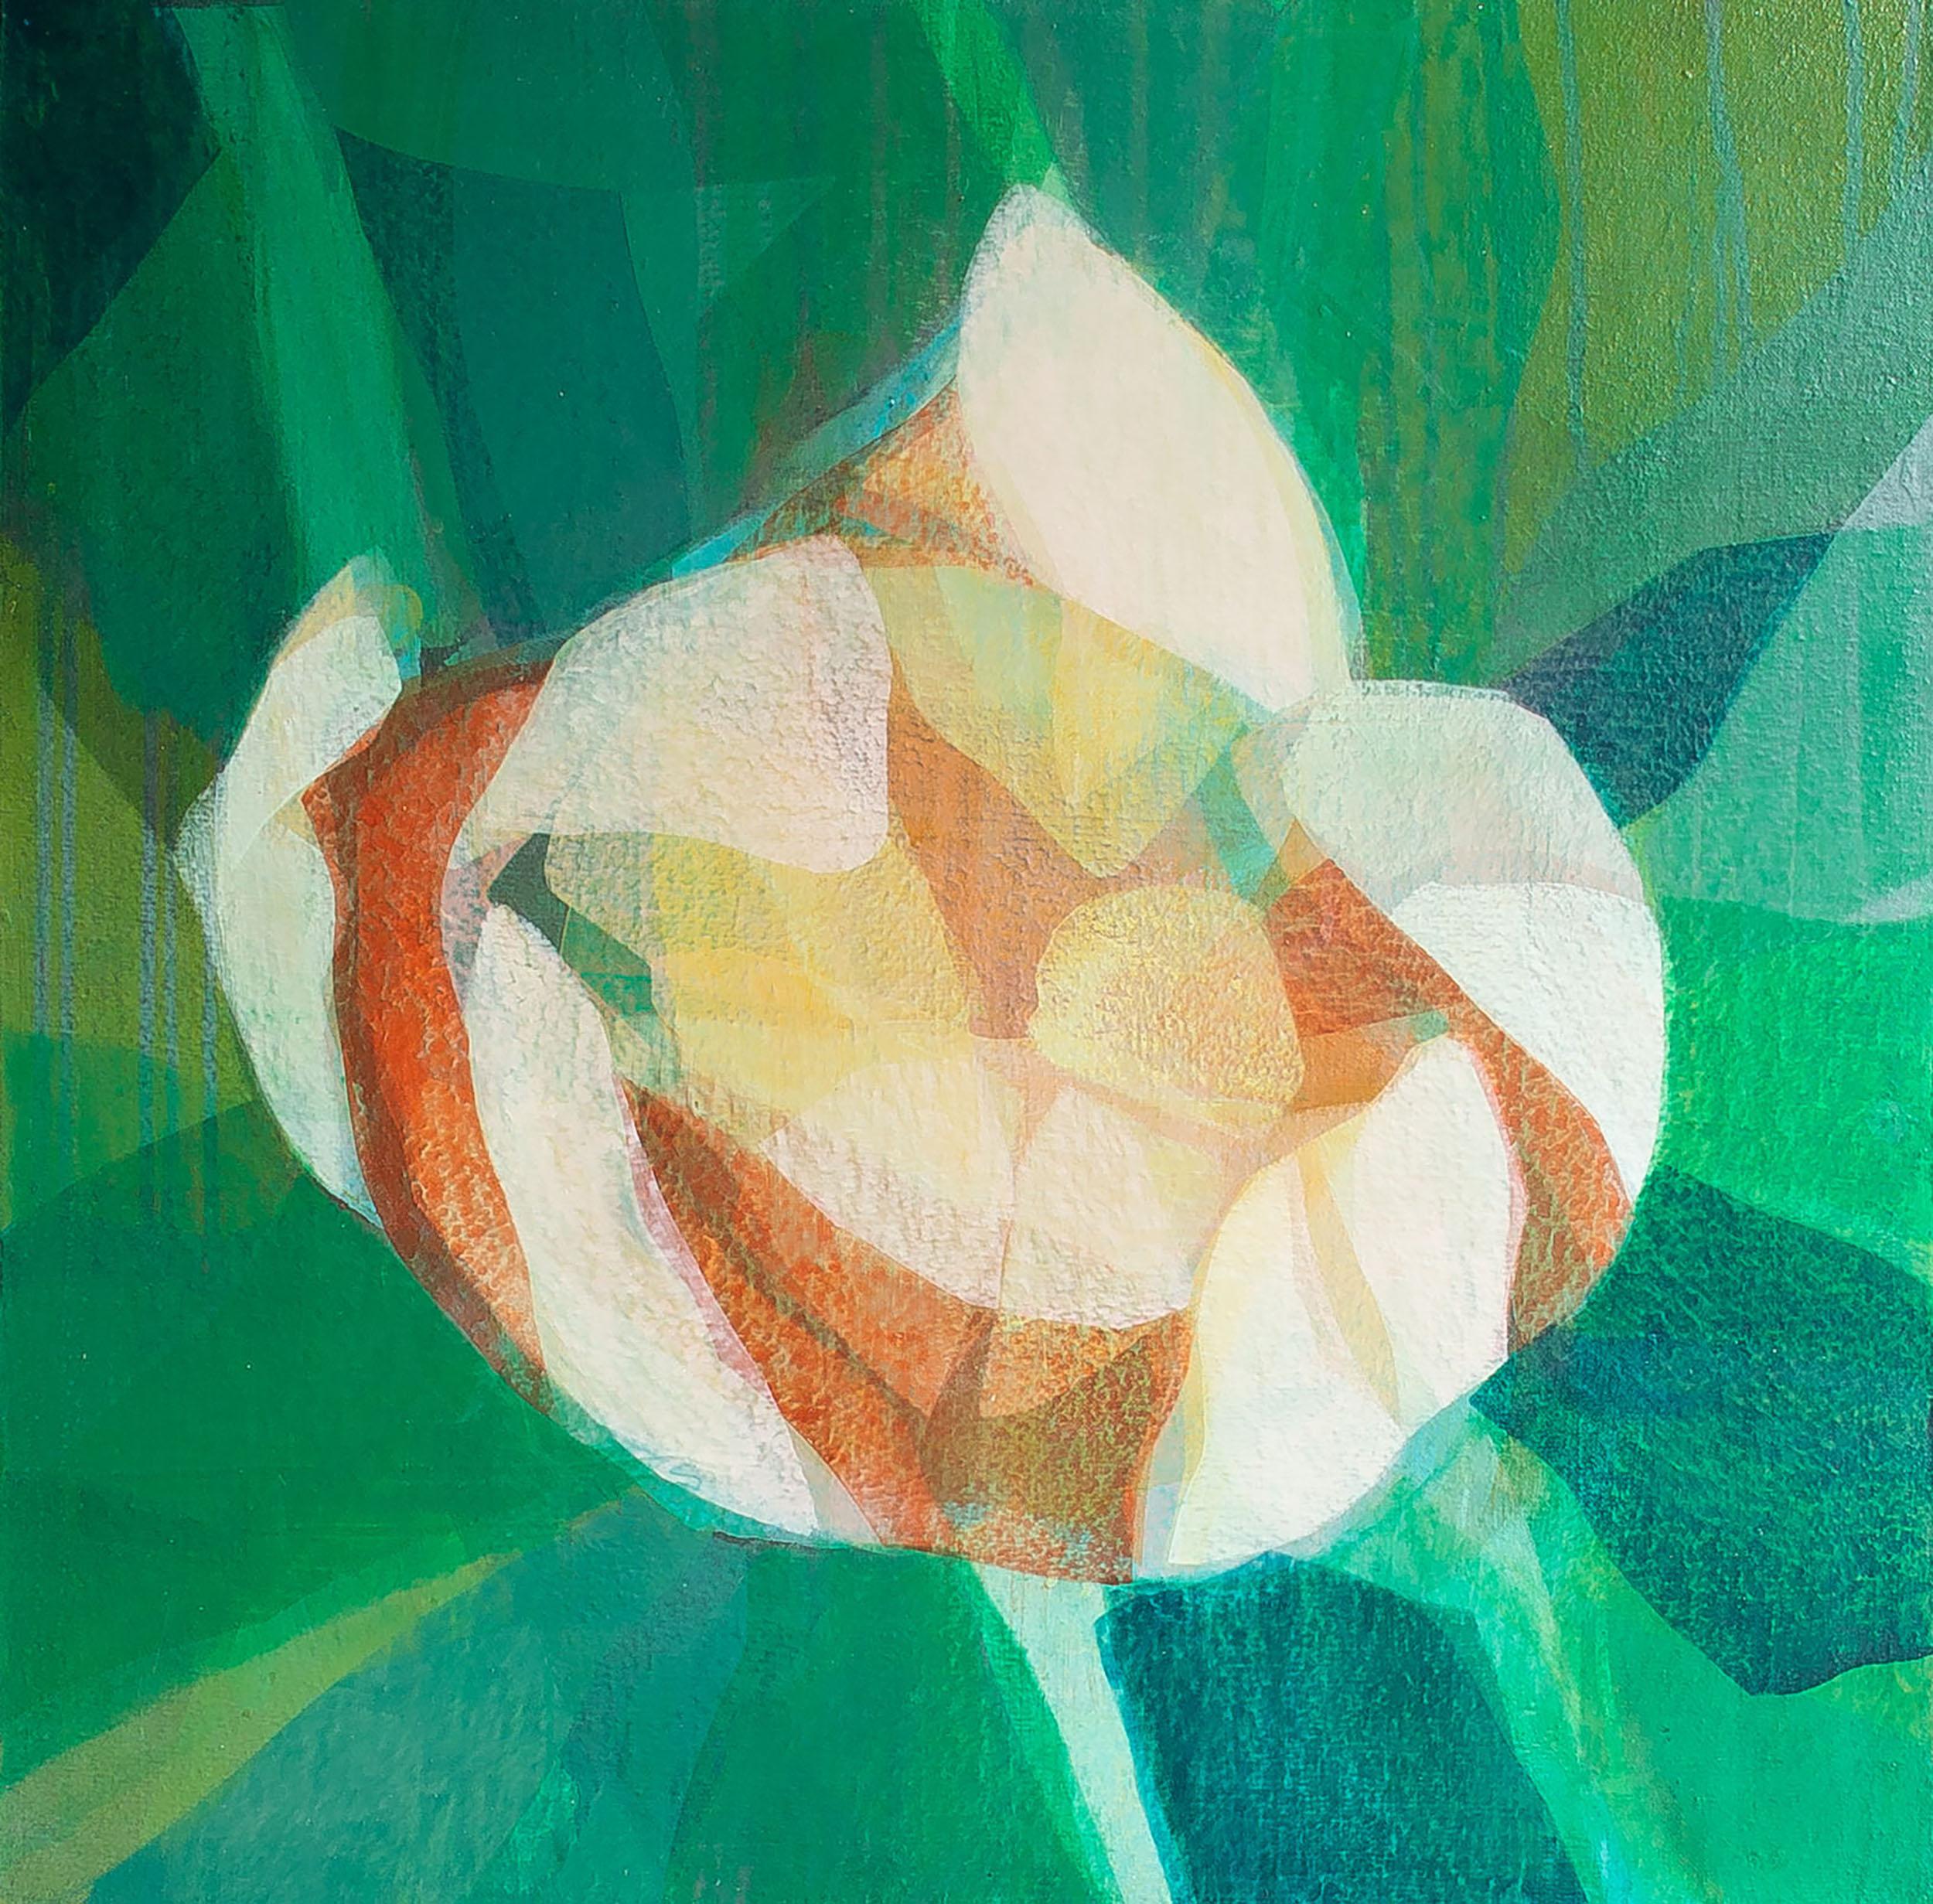 kds_vernonburg_tulip_24s_1819SS.jpg